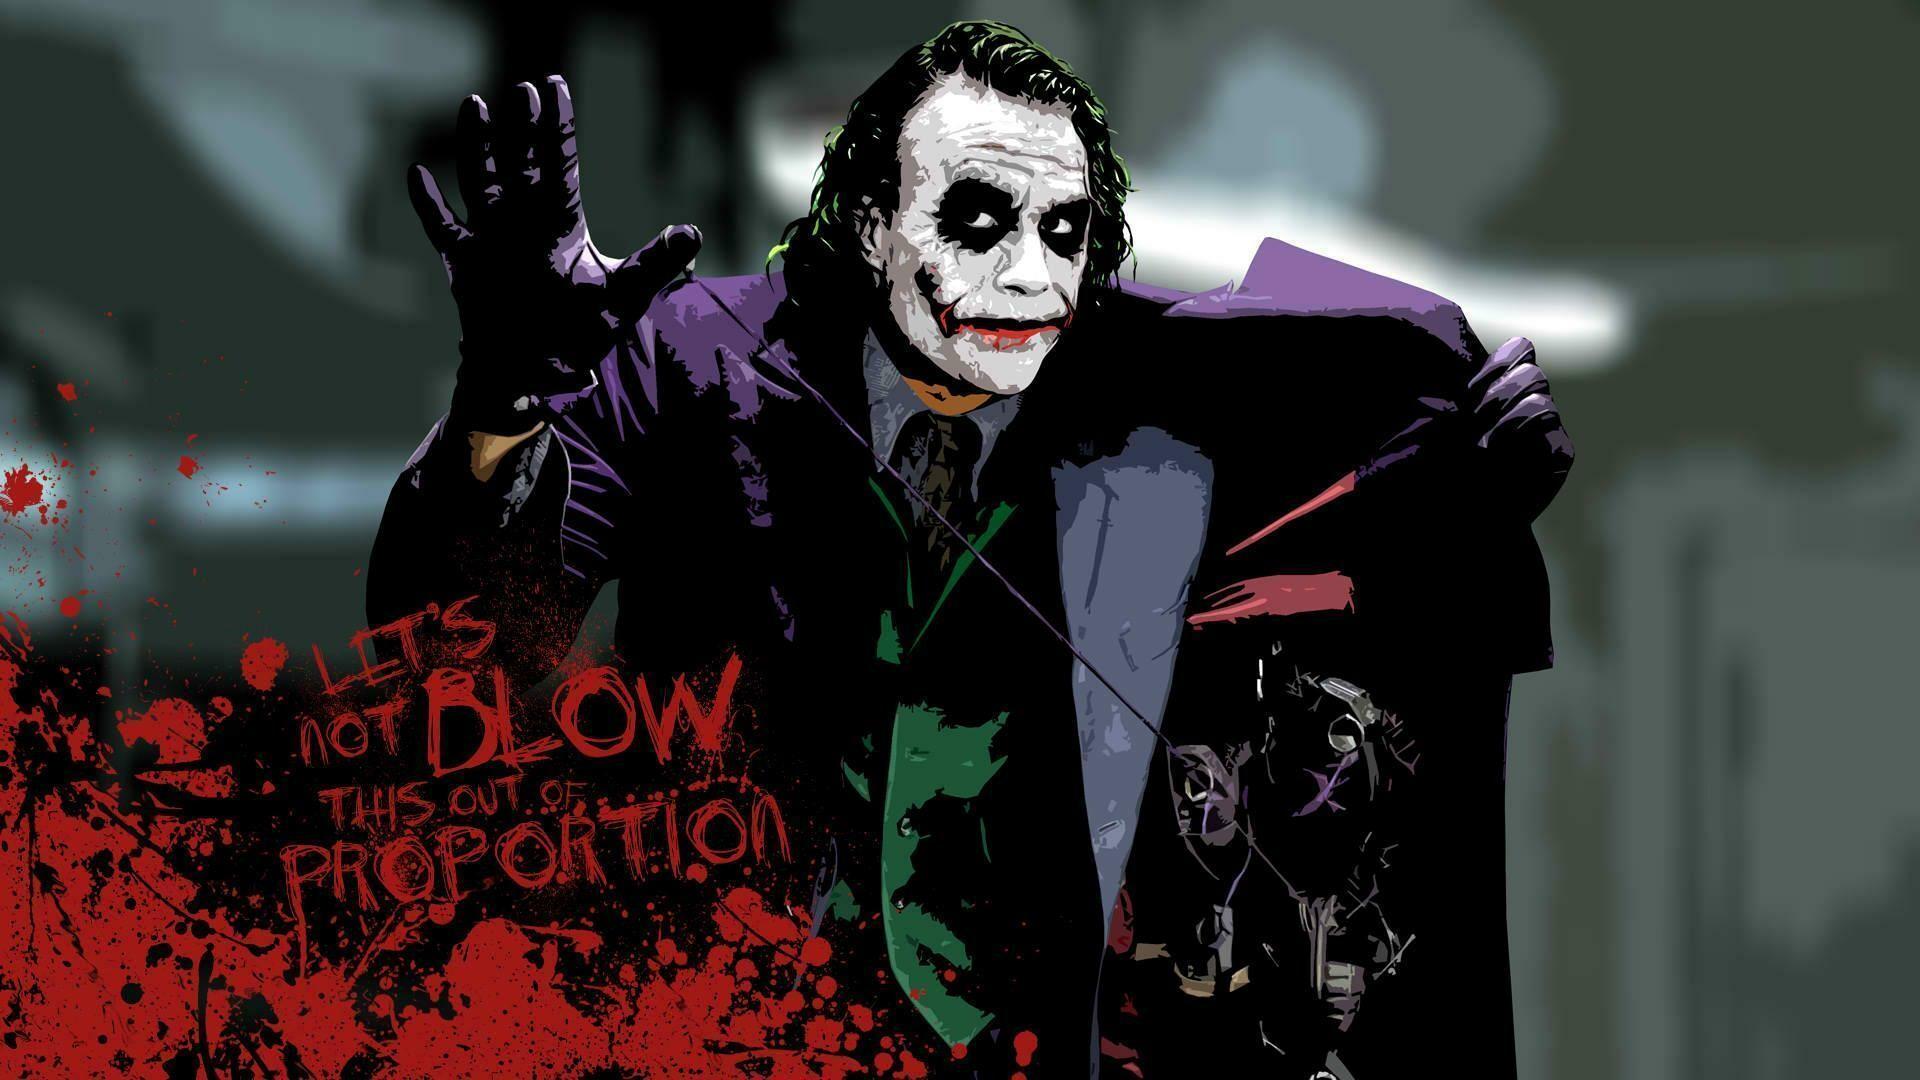 44+ Joker Wallpapers: HD, 4K, 5K for PC ...